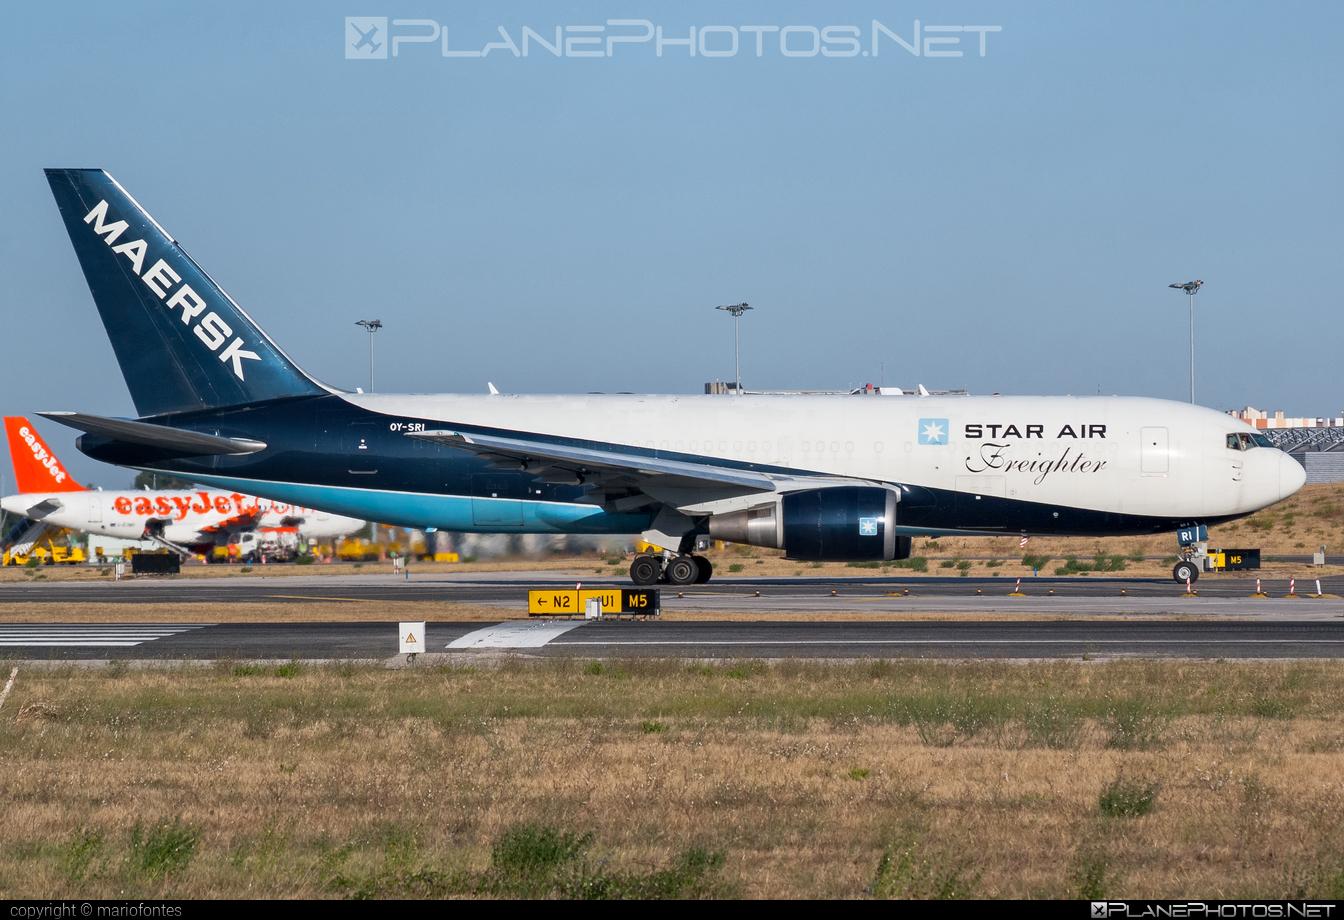 Boeing 767-200BDSF - OY-SRI operated by Star Air #b767 #b767200bdsf #b767bdsf #bedekspecialfreighter #boeing #boeing767